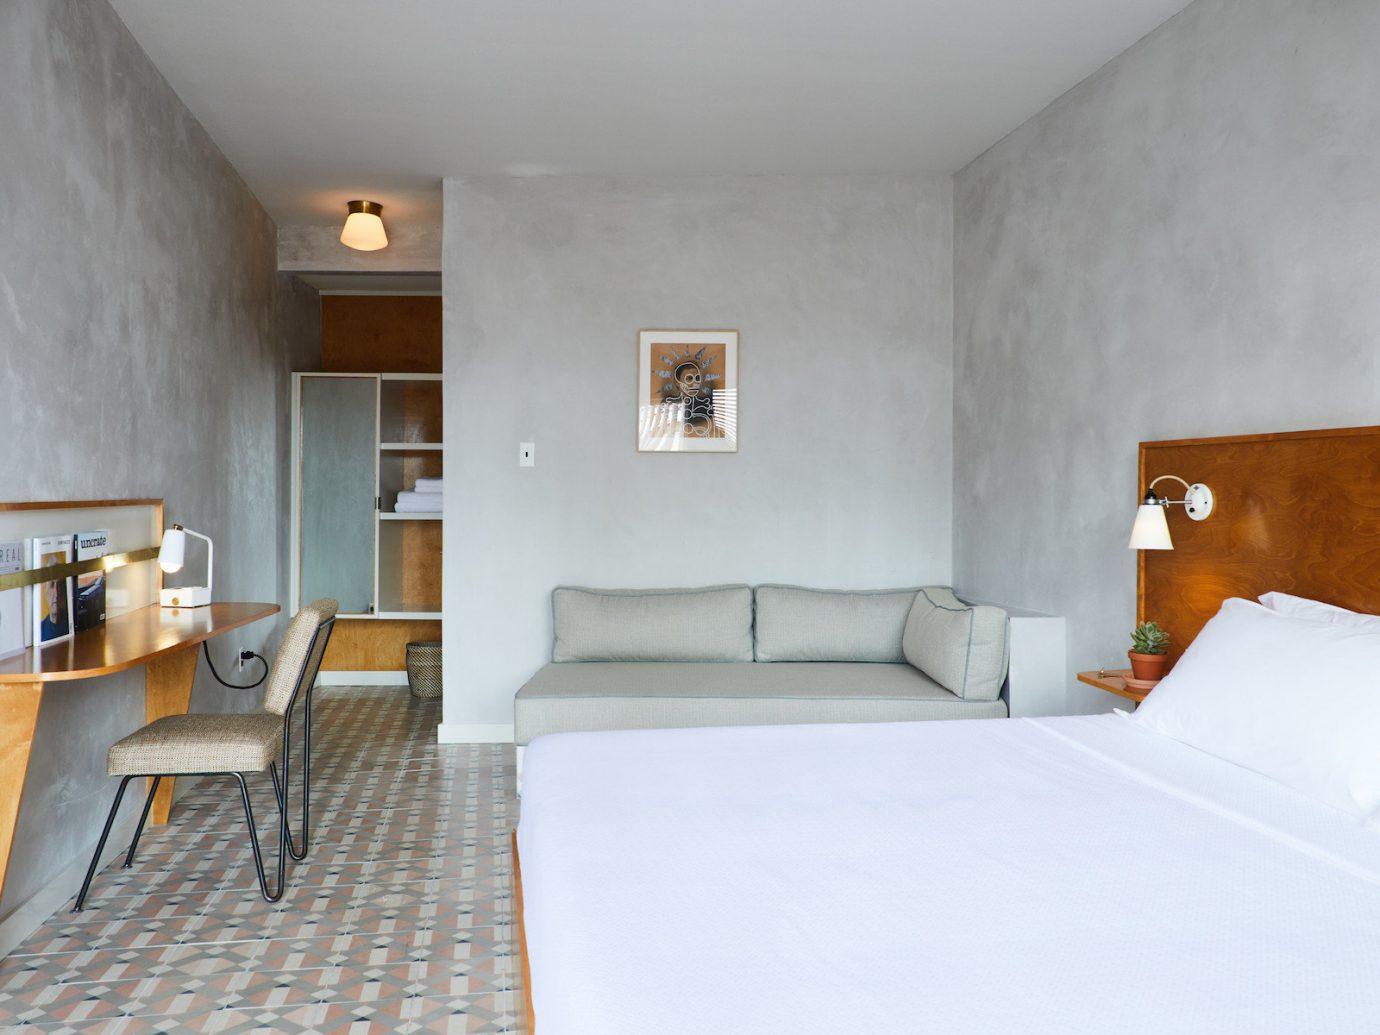 Boutique Hotels Hotels Luxury Travel Trip Ideas Weekend Getaways Winter property Architecture Suite Bedroom house interior designer comfort living room